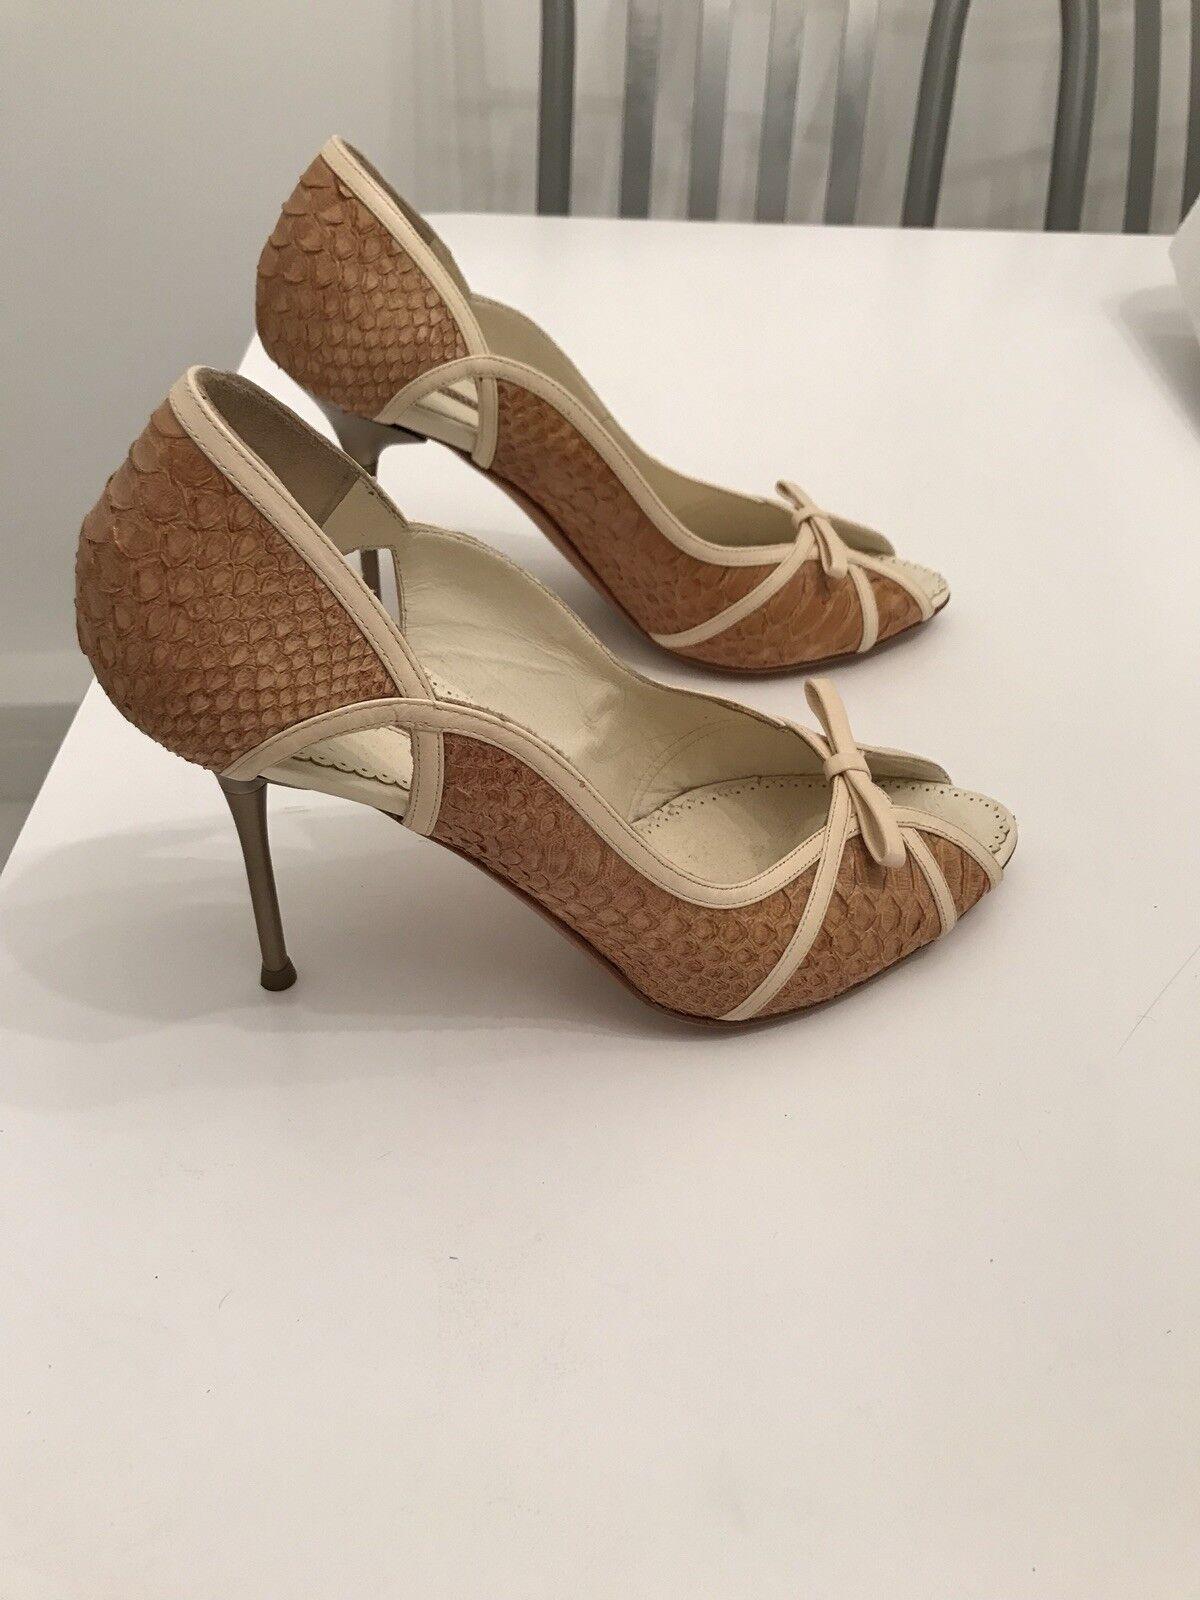 Gianmarco Lorenzi Snakeskin Leather Beige Cream Peep Toe Heel RARE 37 7